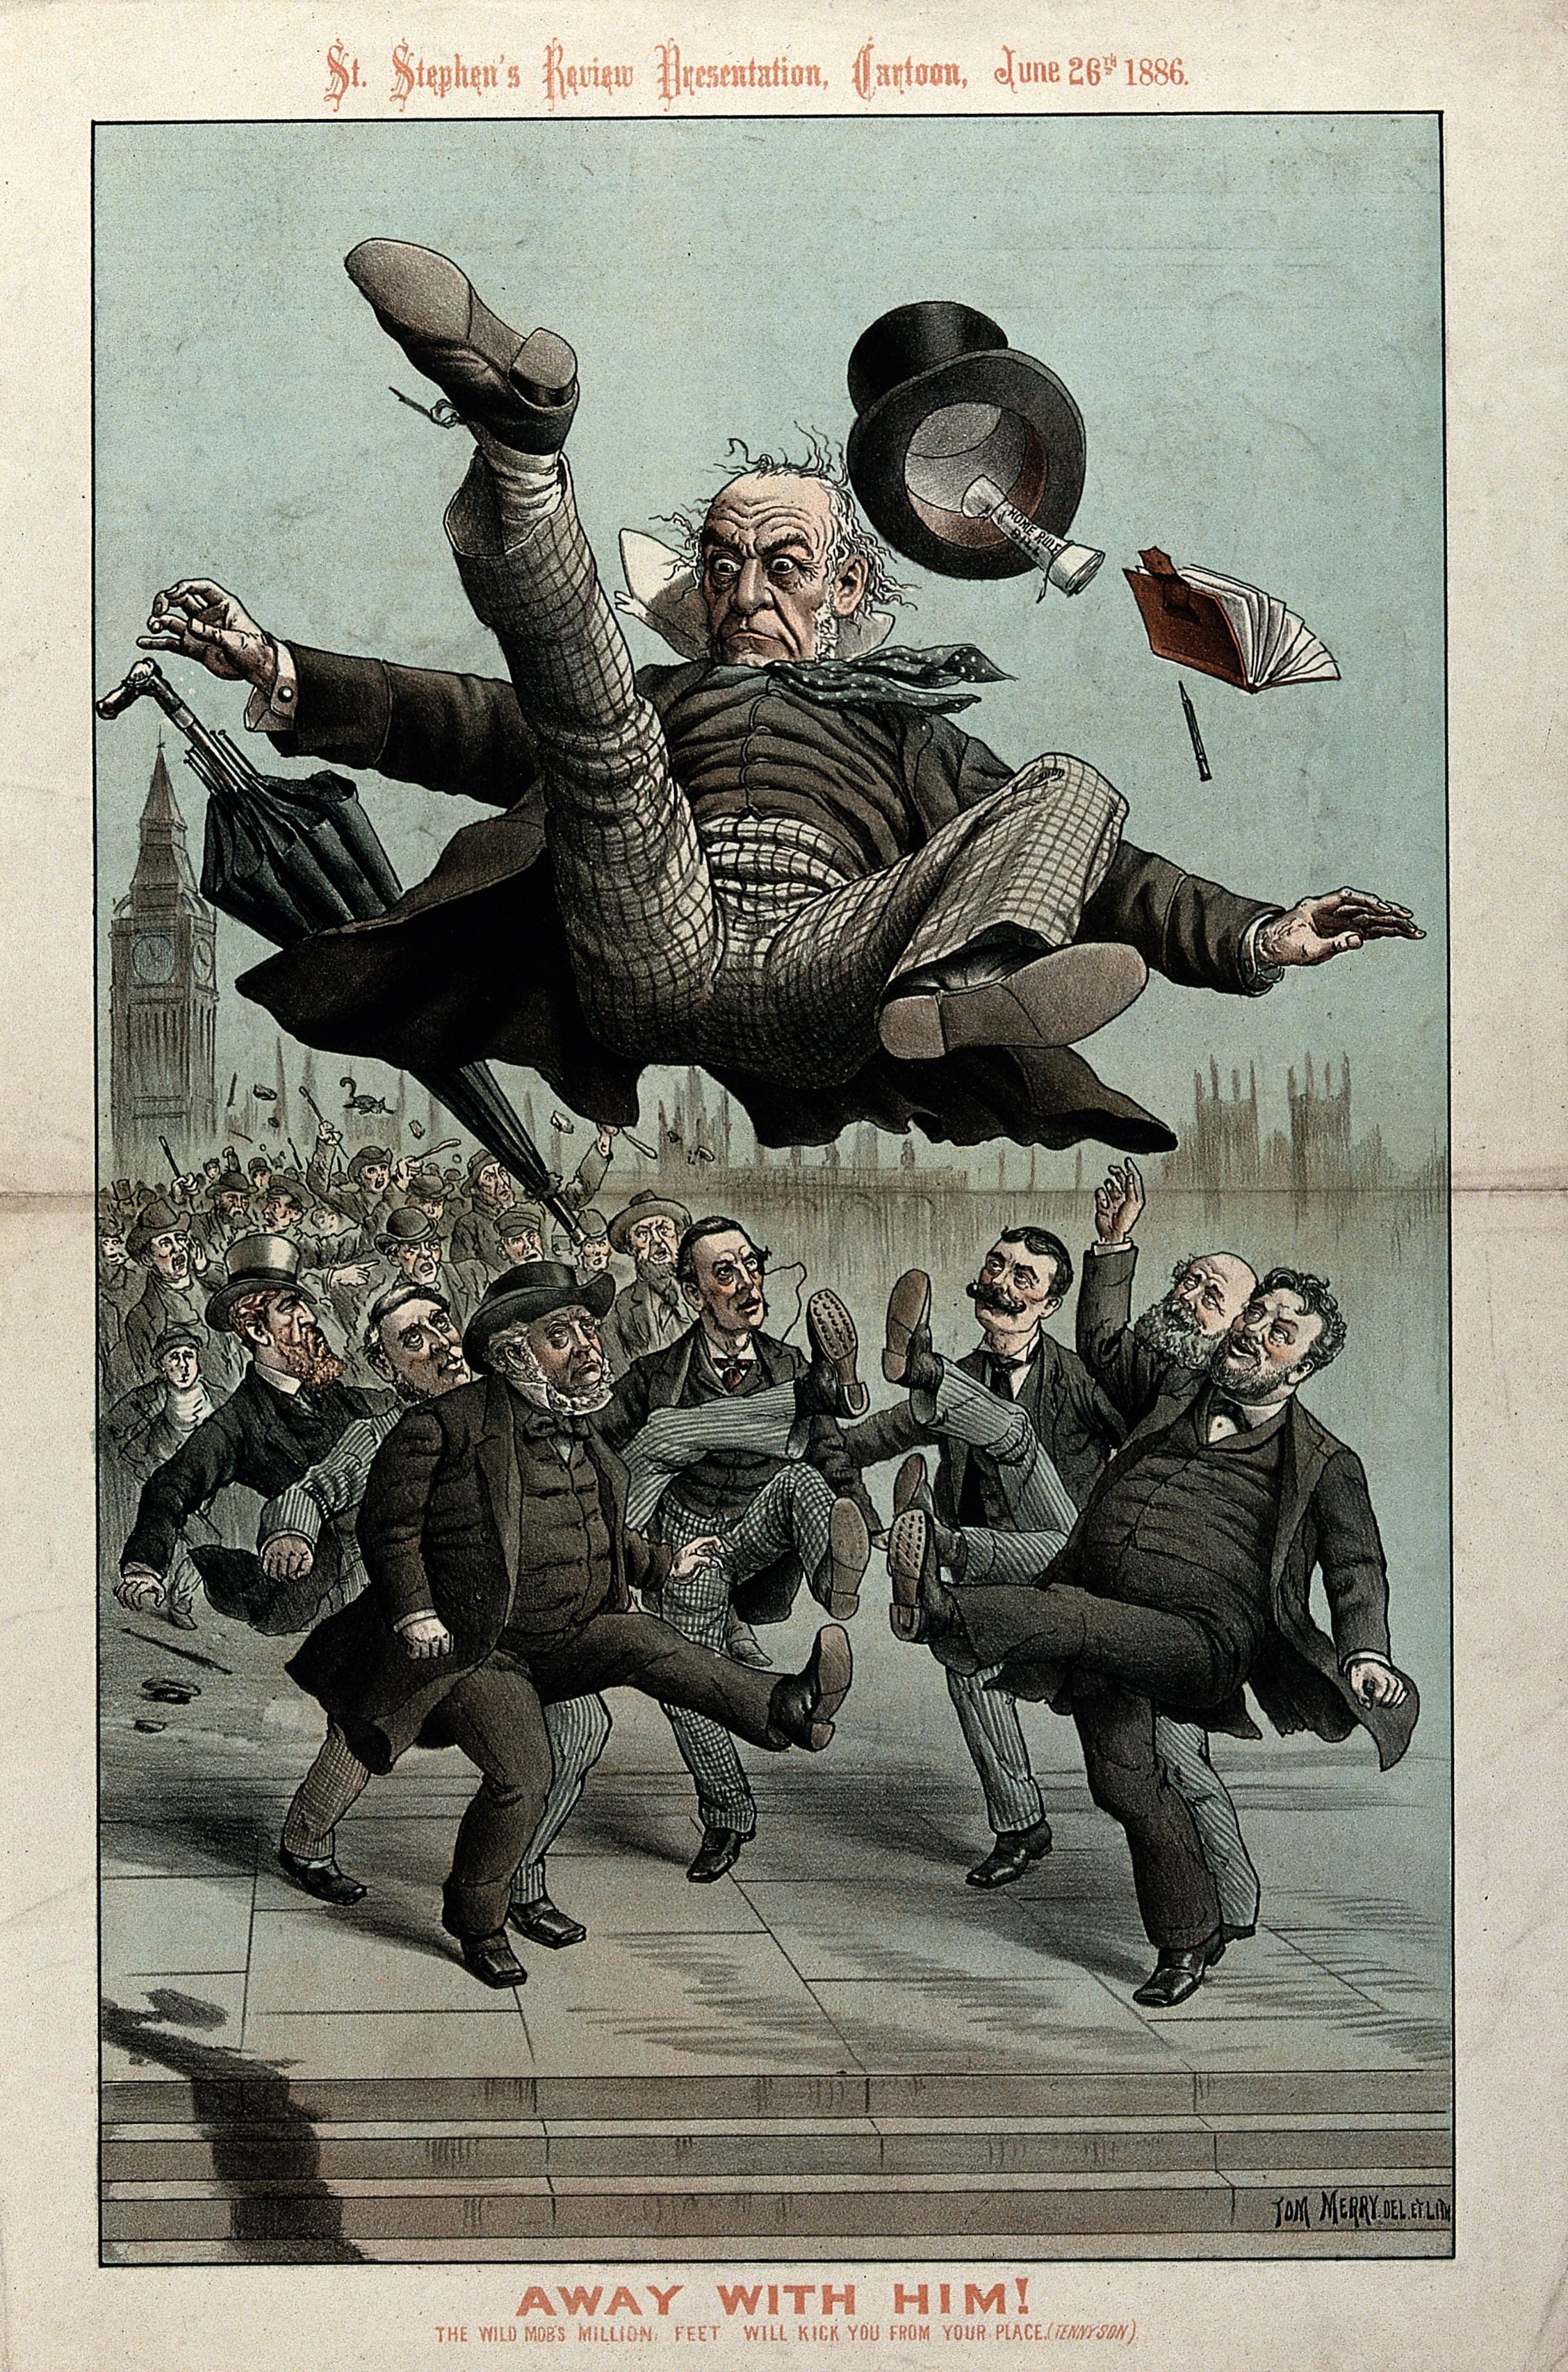 william ewart gladstone - wikipedia